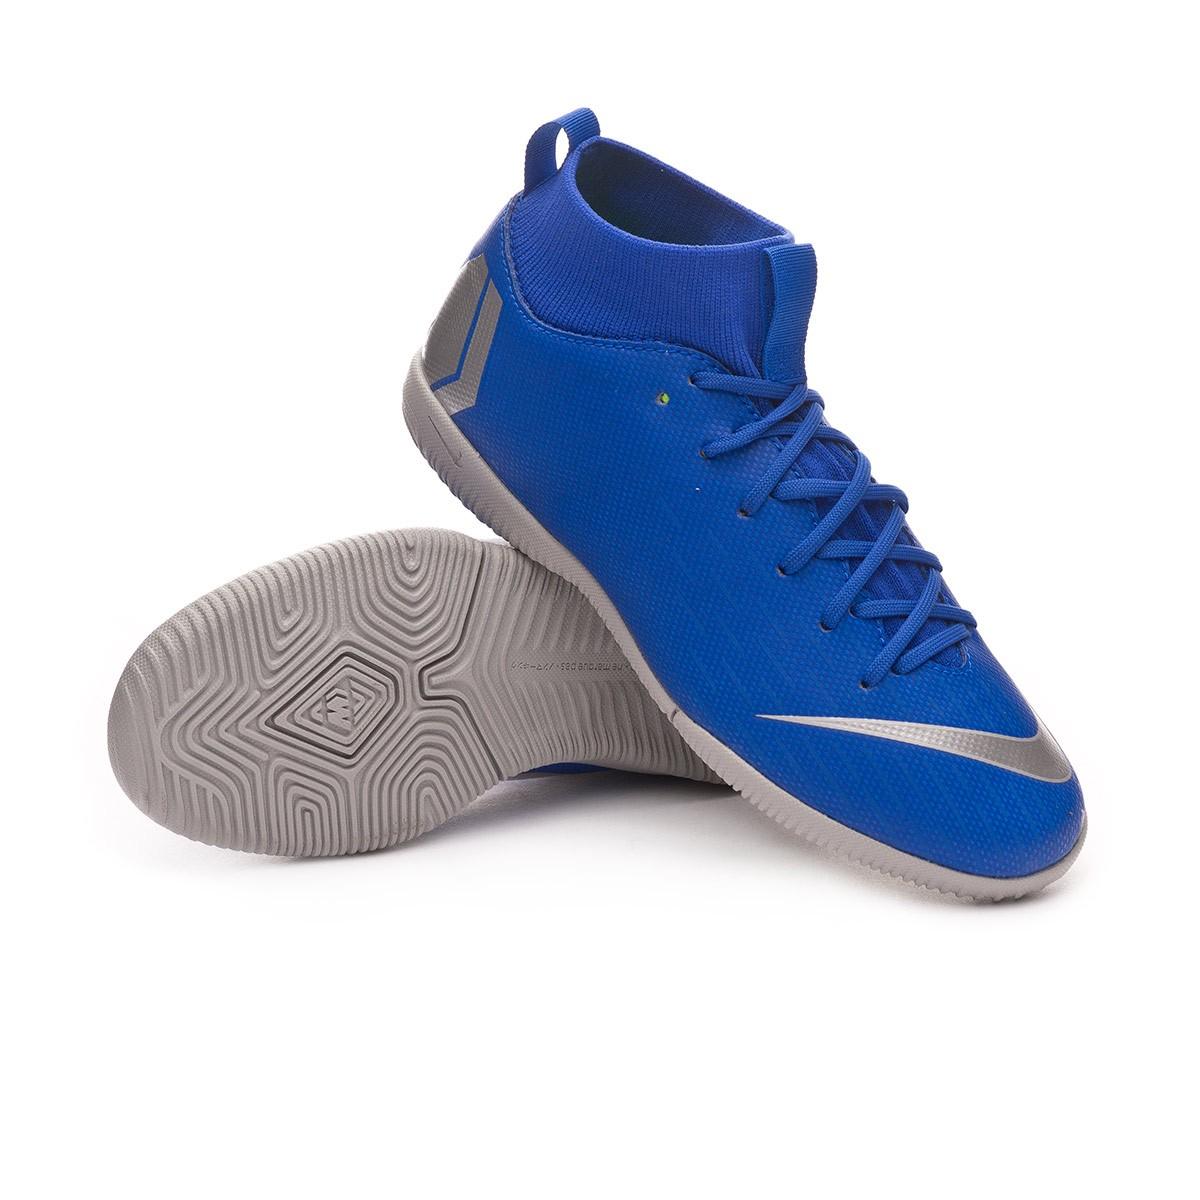 c81c5e52734d Nike Kids Mercurial SuperflyX VI Academy IC Futsal Boot. Racer blue-Metallic  ...